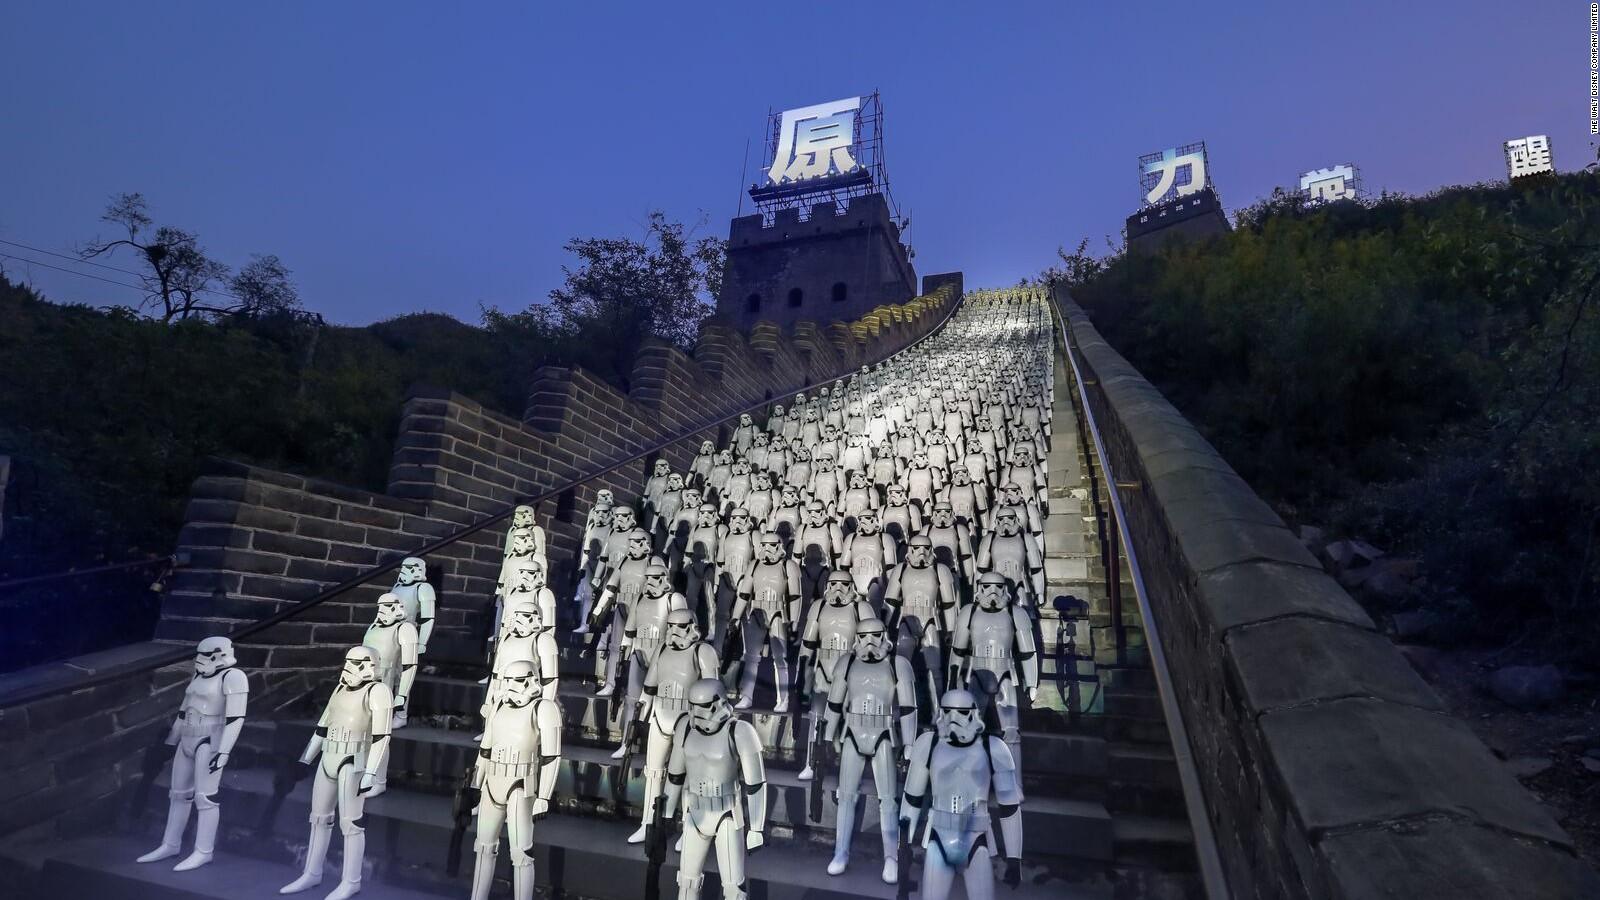 Star Wars The Force Awakens China poster racist   CNN 1600x900